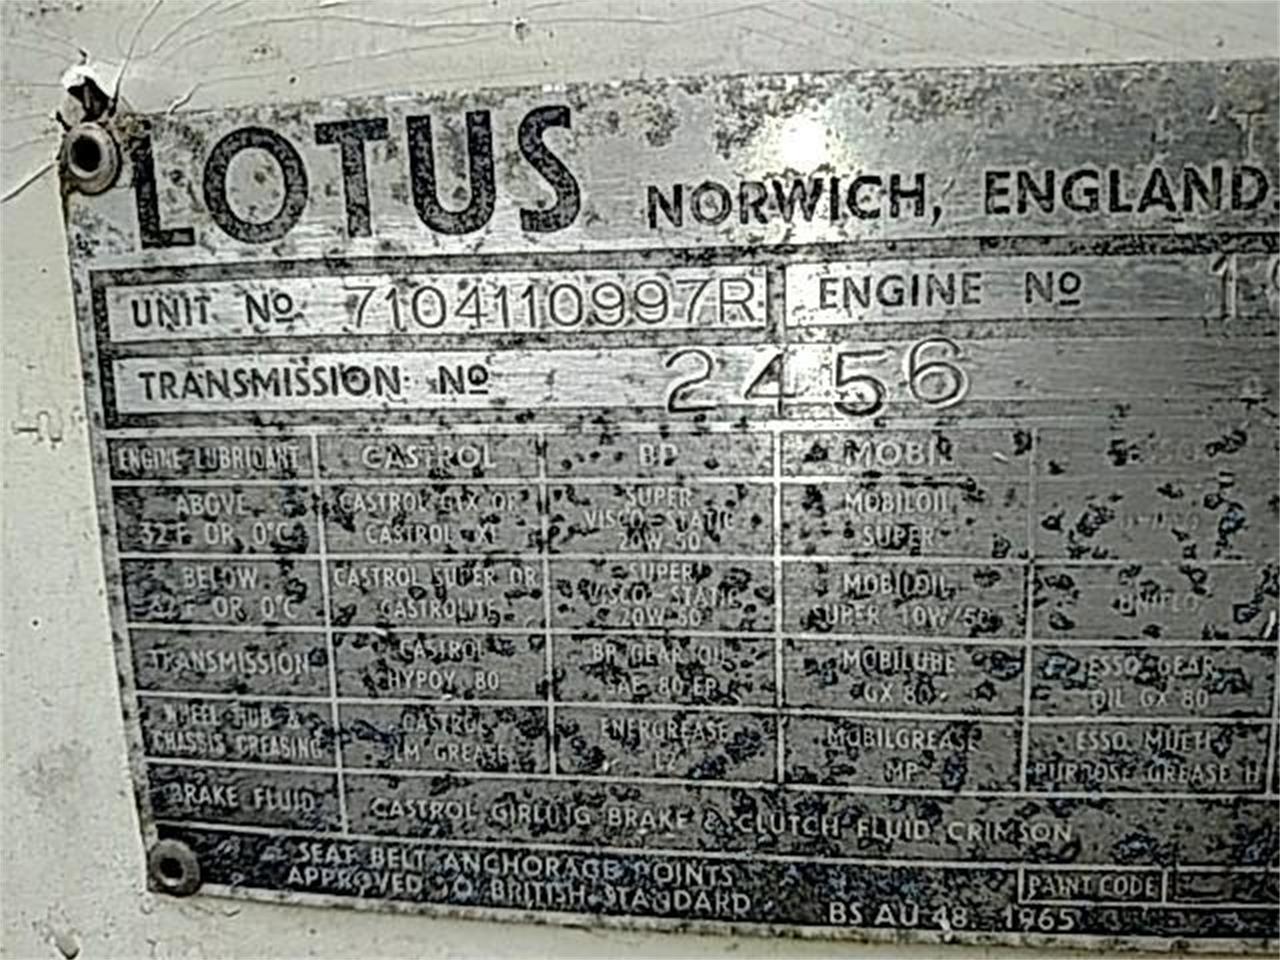 1971 Lotus Europa (CC-1336169) for sale in Simi Valley, California